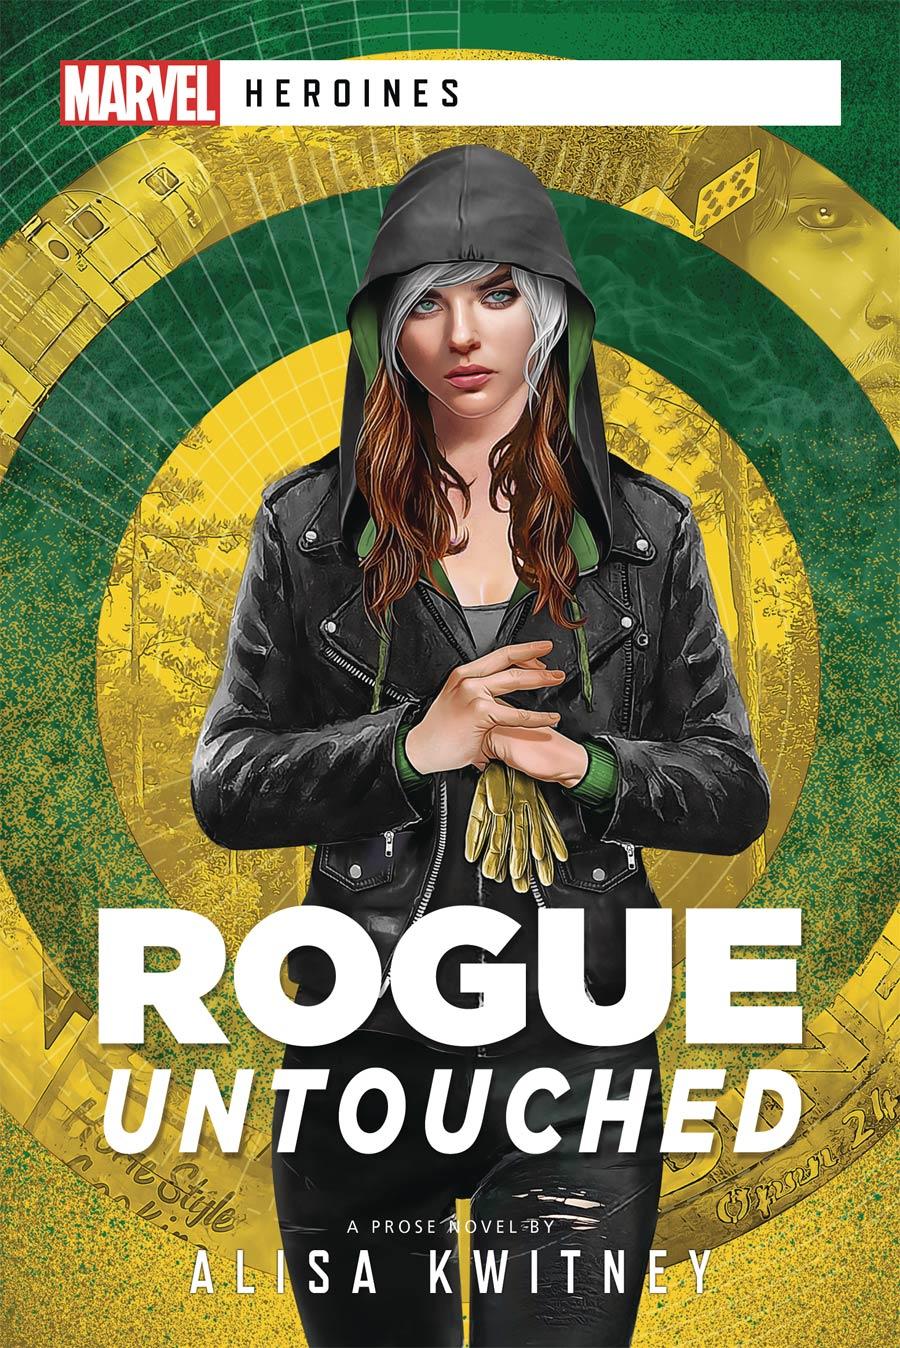 Marvel Heroines Novel Rogue Untouched SC